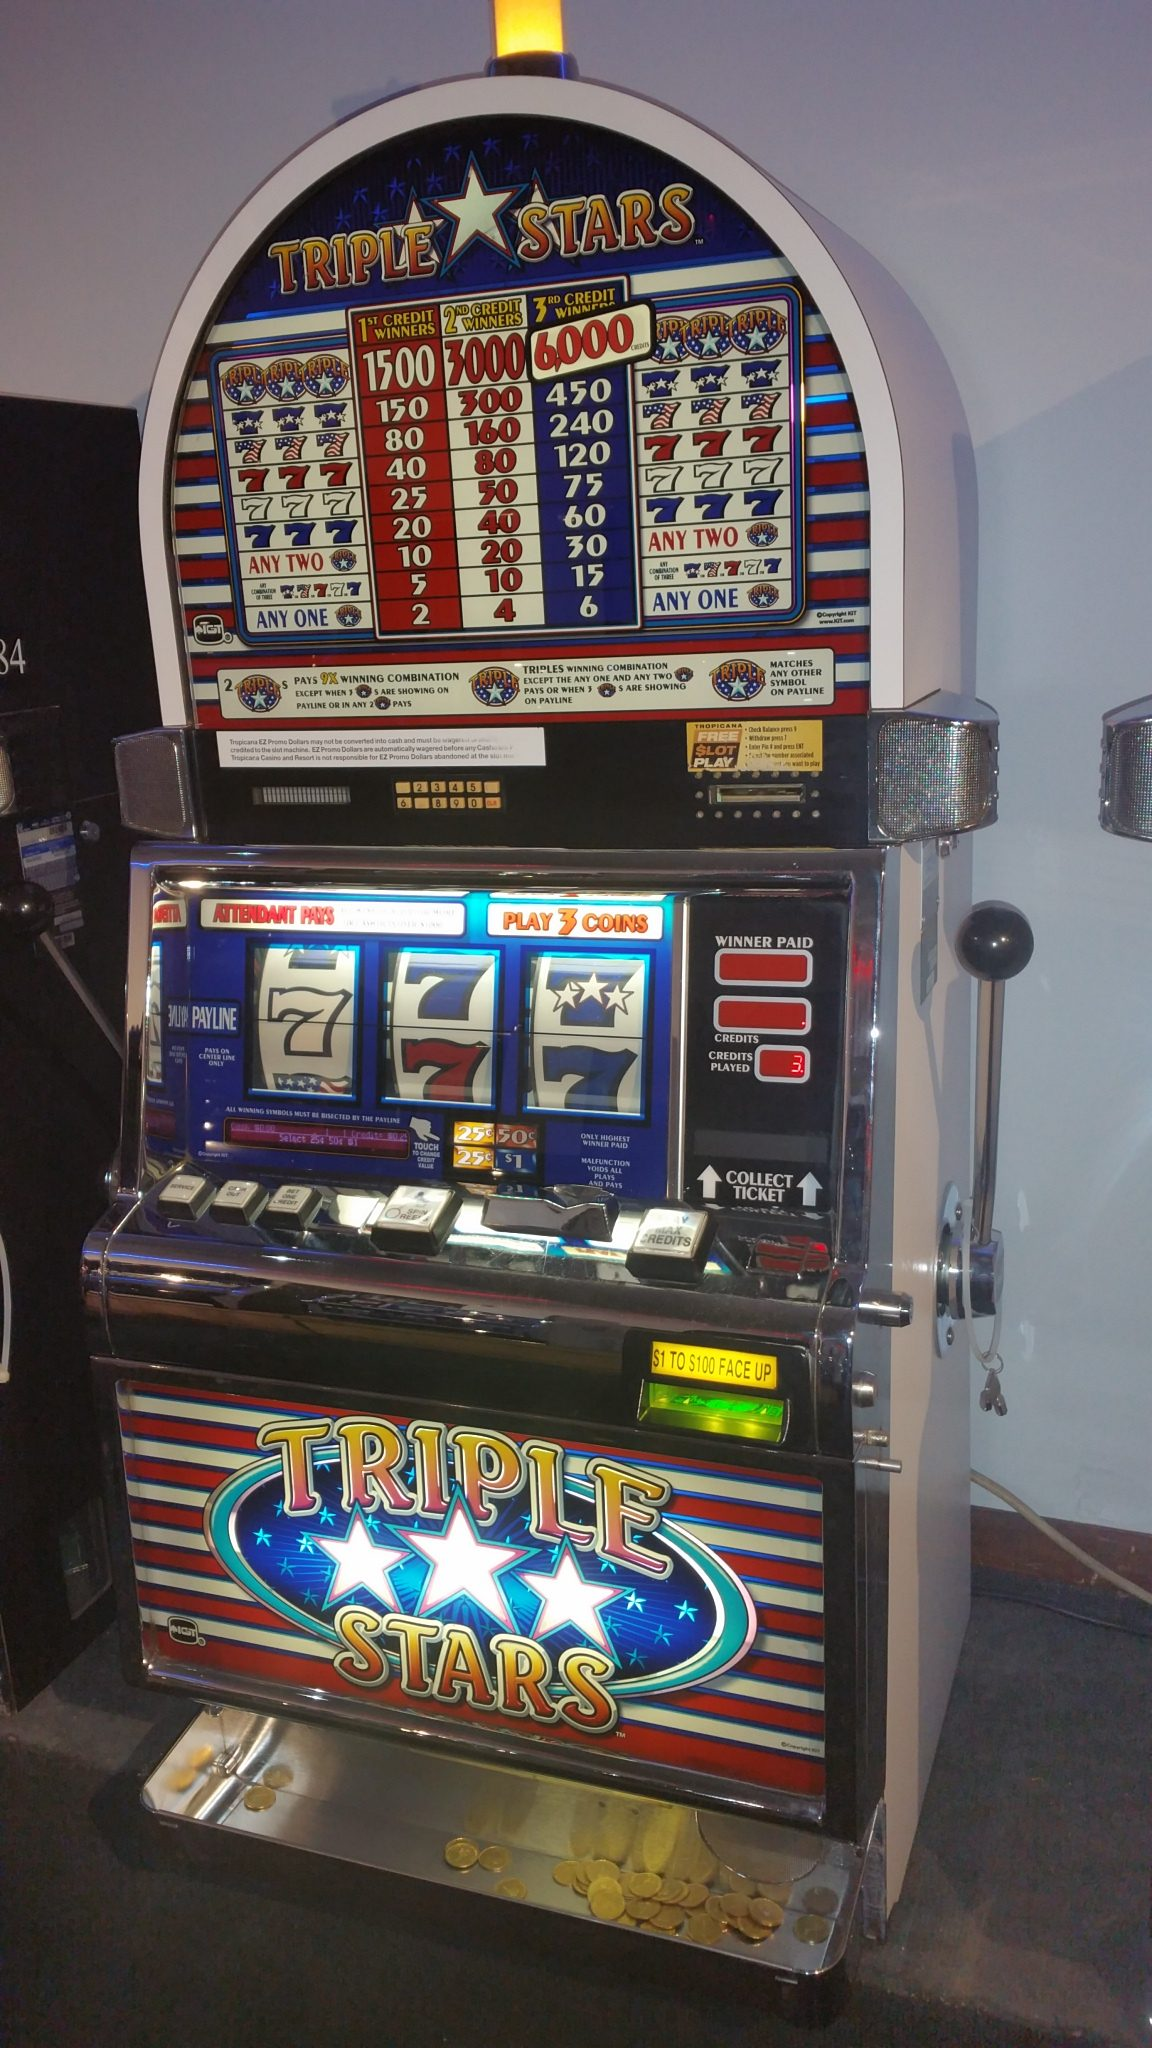 IGT S2000 Triple Stars 3 Coin Quarter Slot Machine